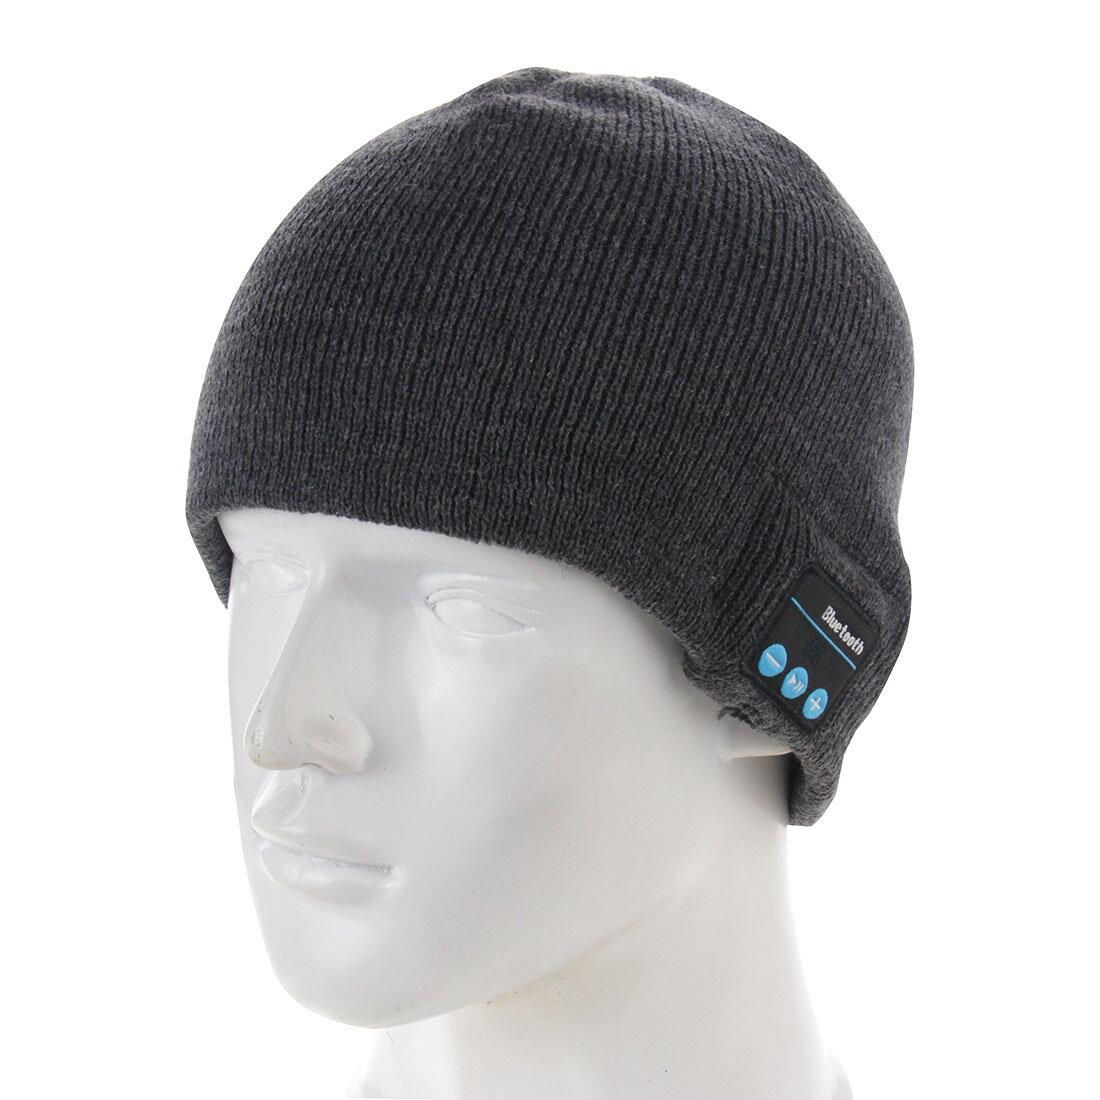 9289a344041 Generic Bluetooth Headset